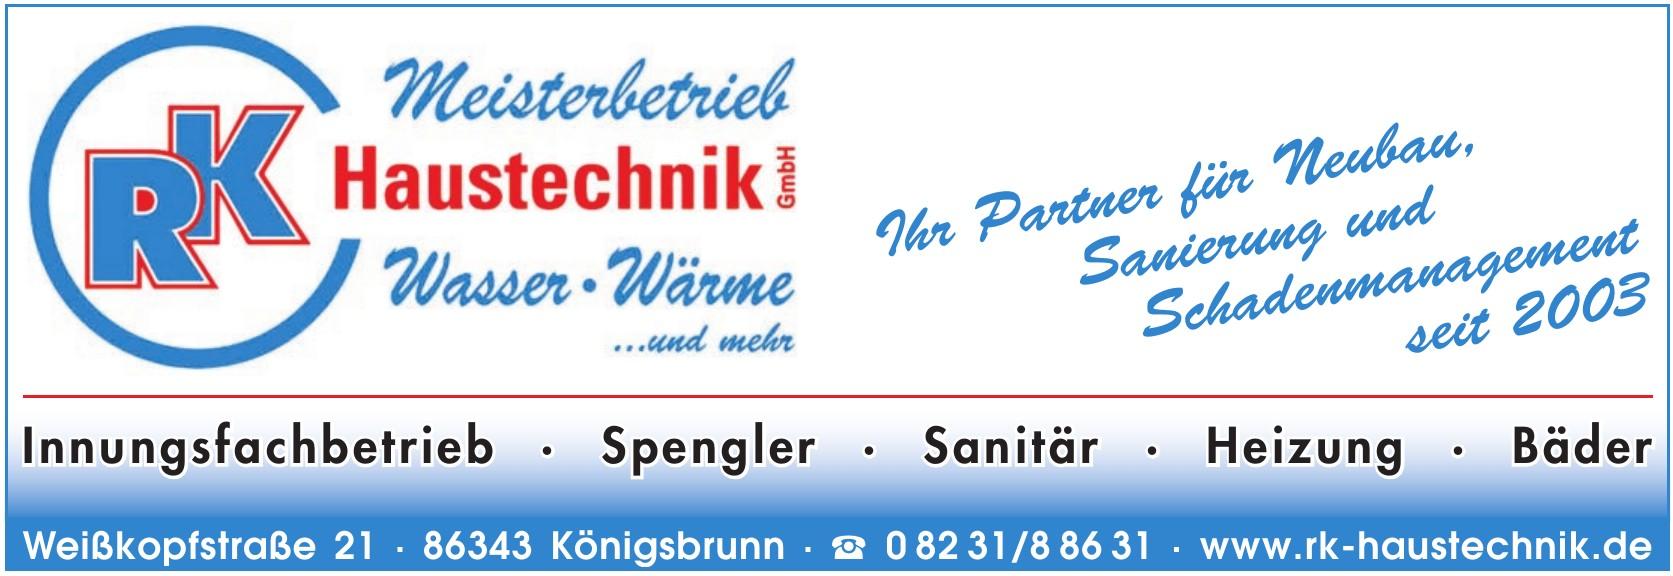 RK Haustechnik GmbH